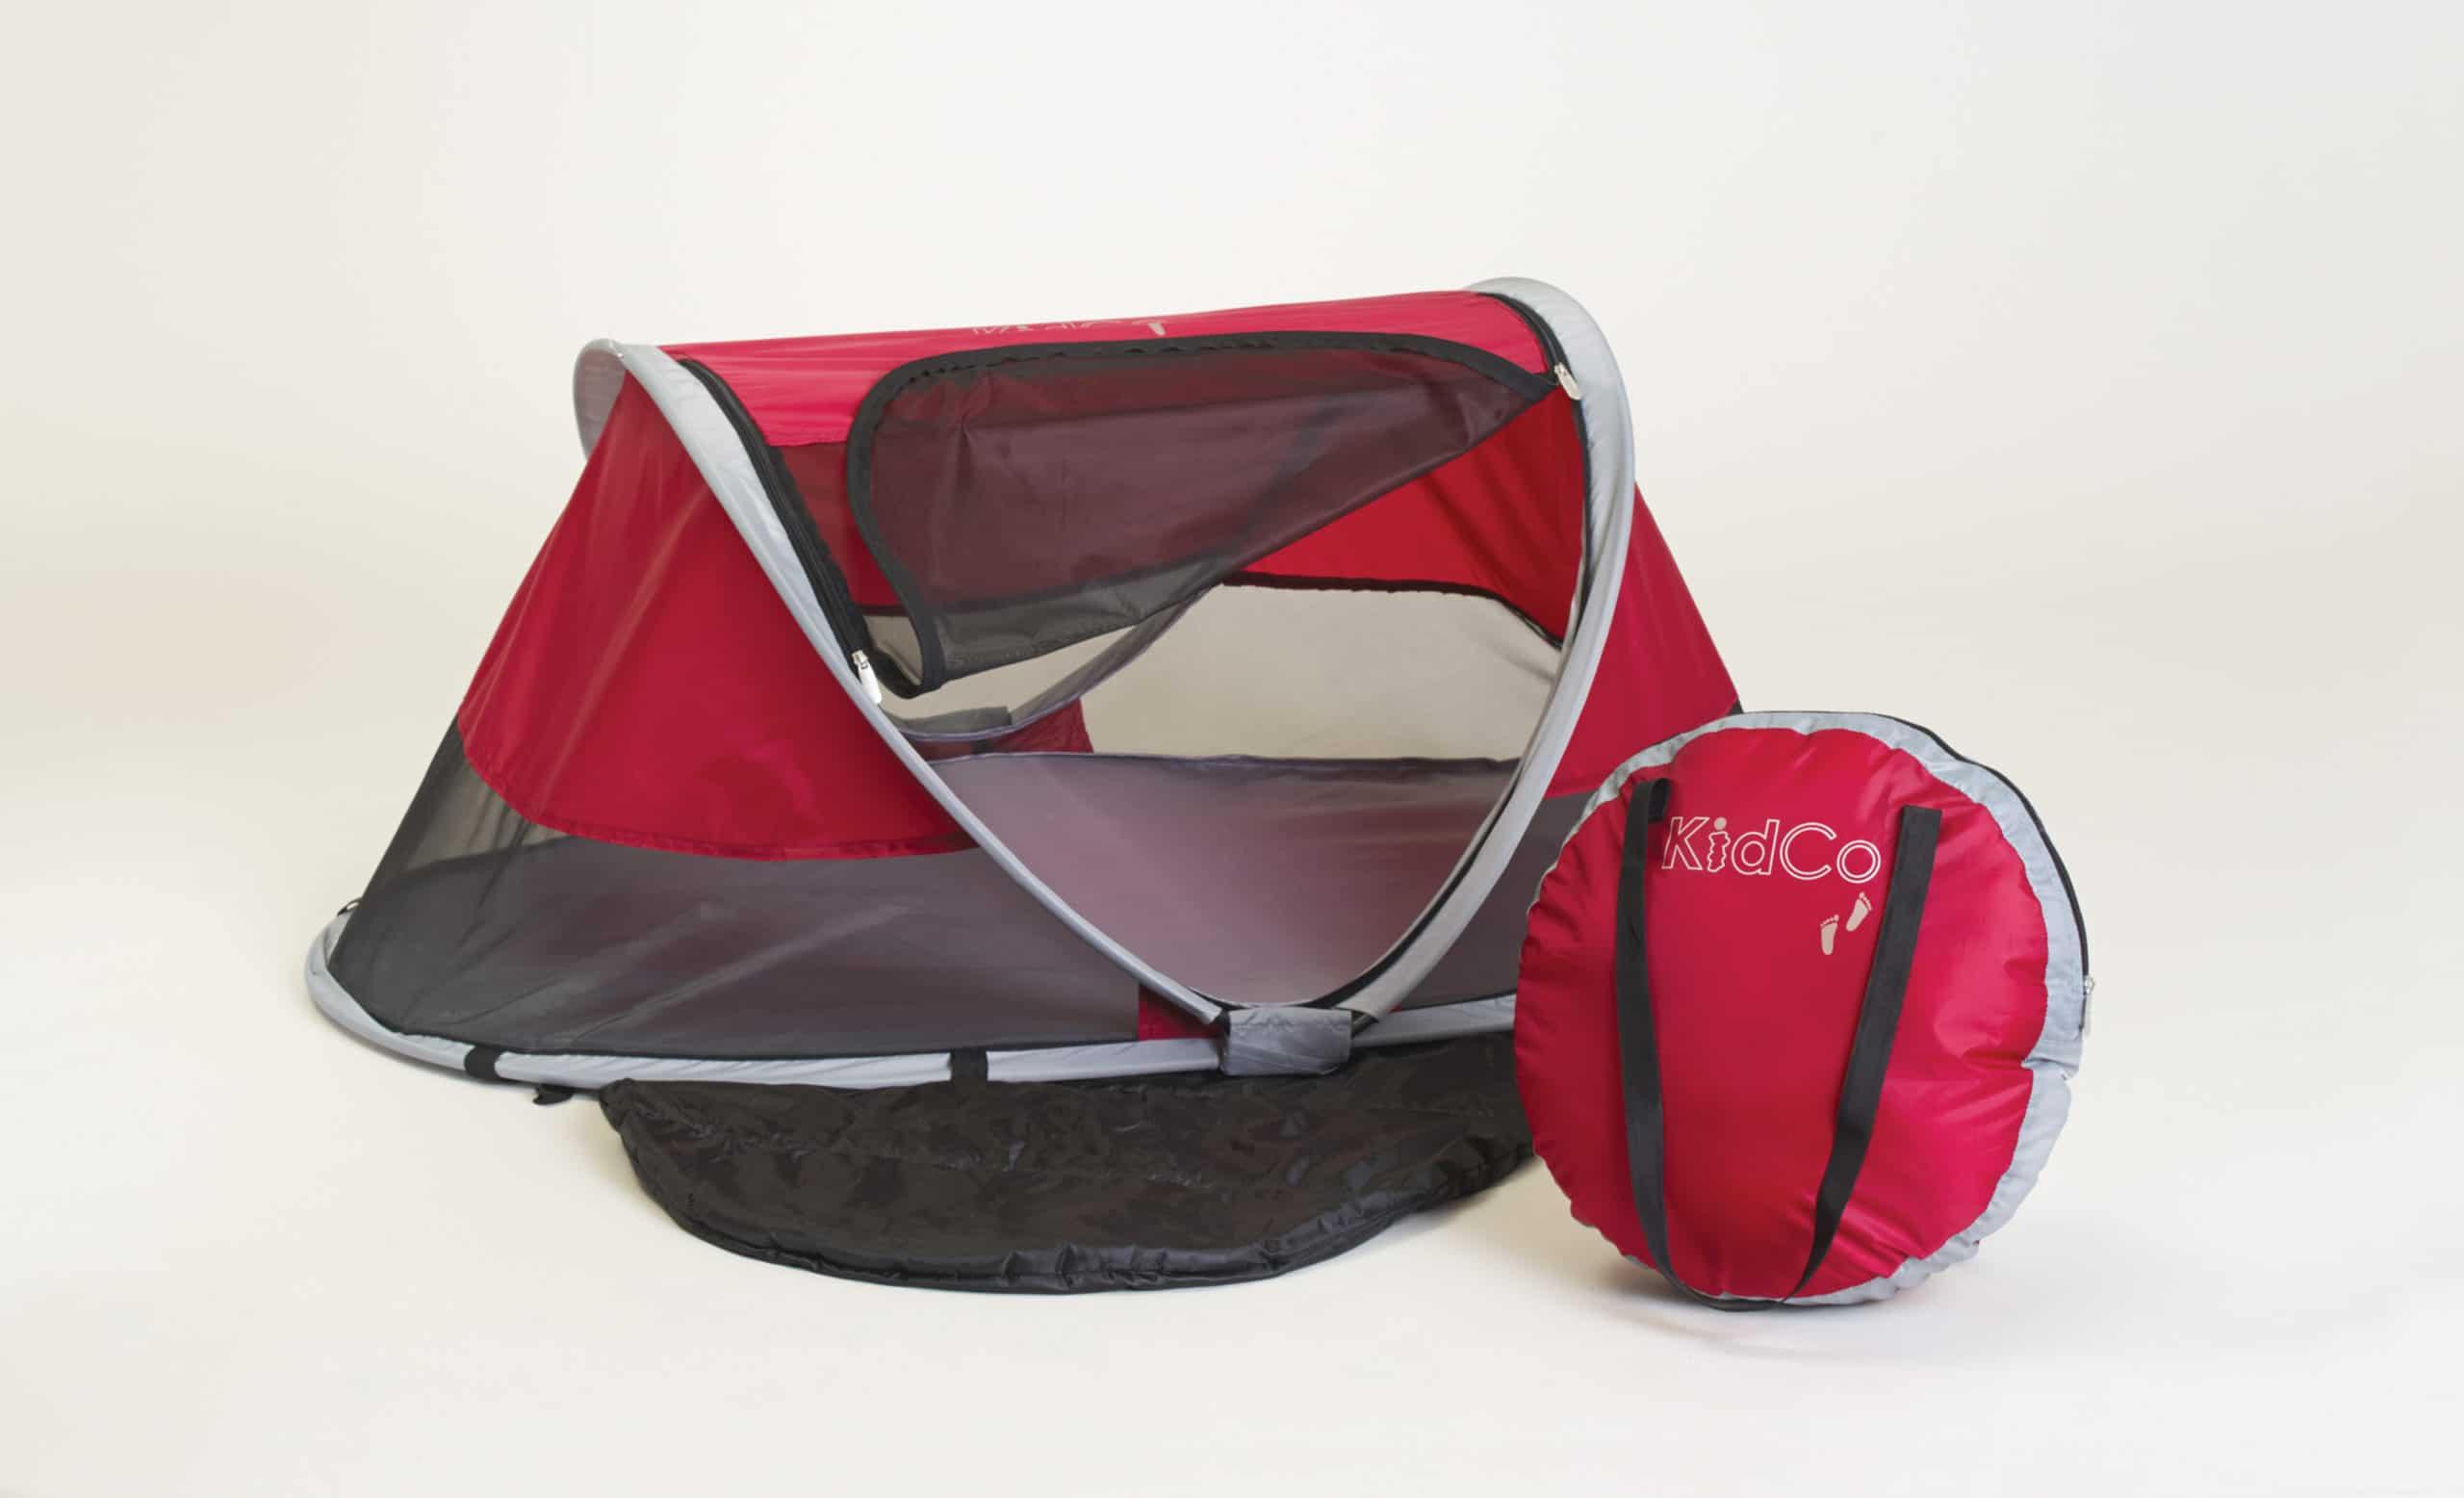 Peapod Travel Bed Kidco